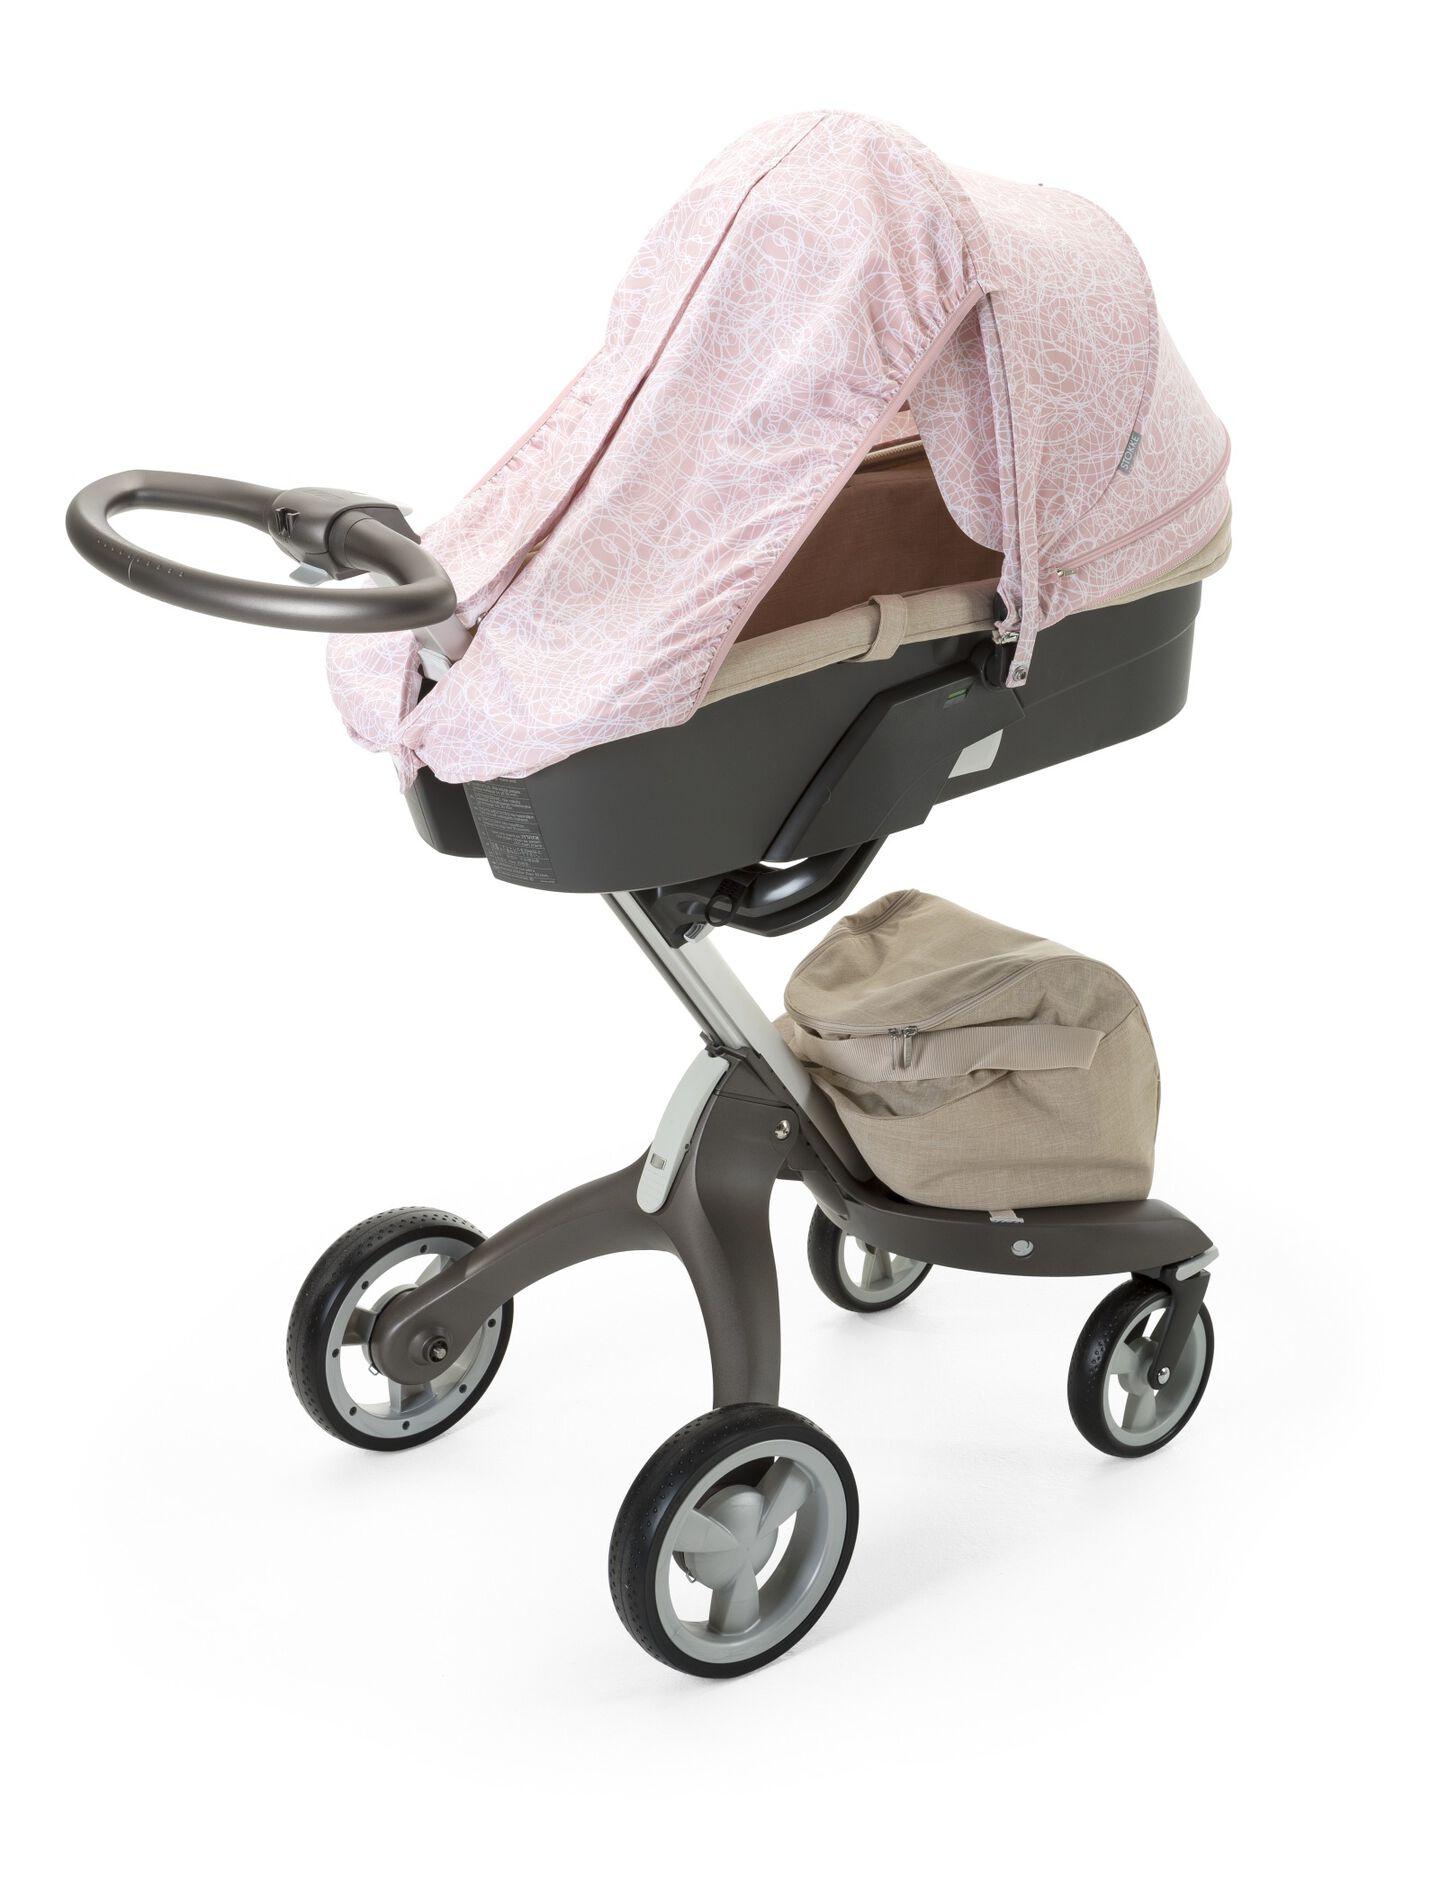 Stokke® Stroller Summer Kit Scribble Faded Pink with Stokke® Xplory® chassis, Beige Melange